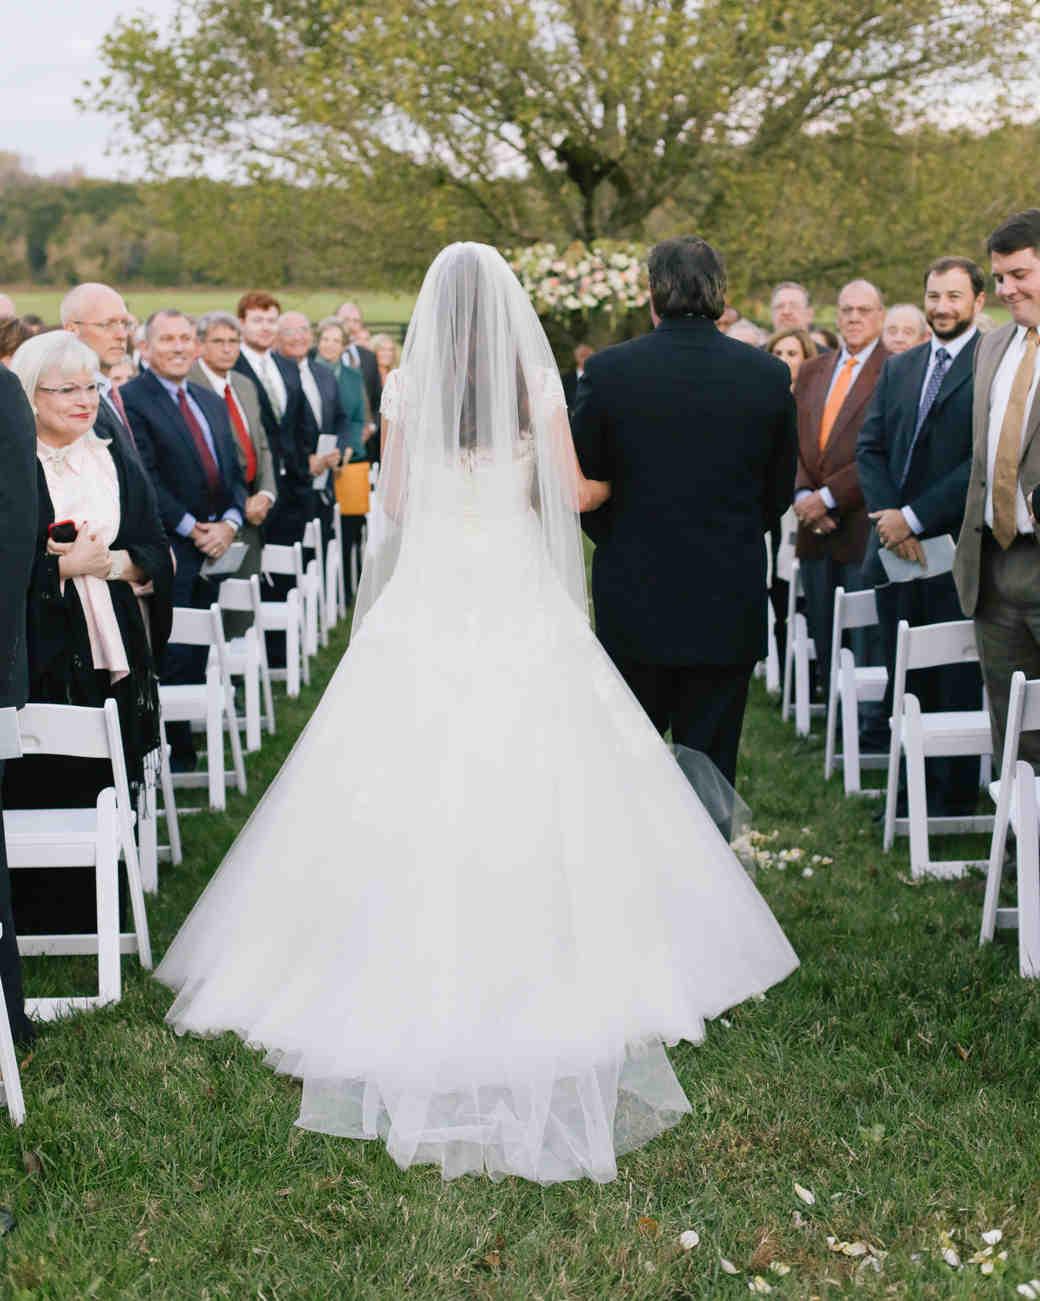 destiny-taylor-wedding-processional-400-s112347-1115.jpg